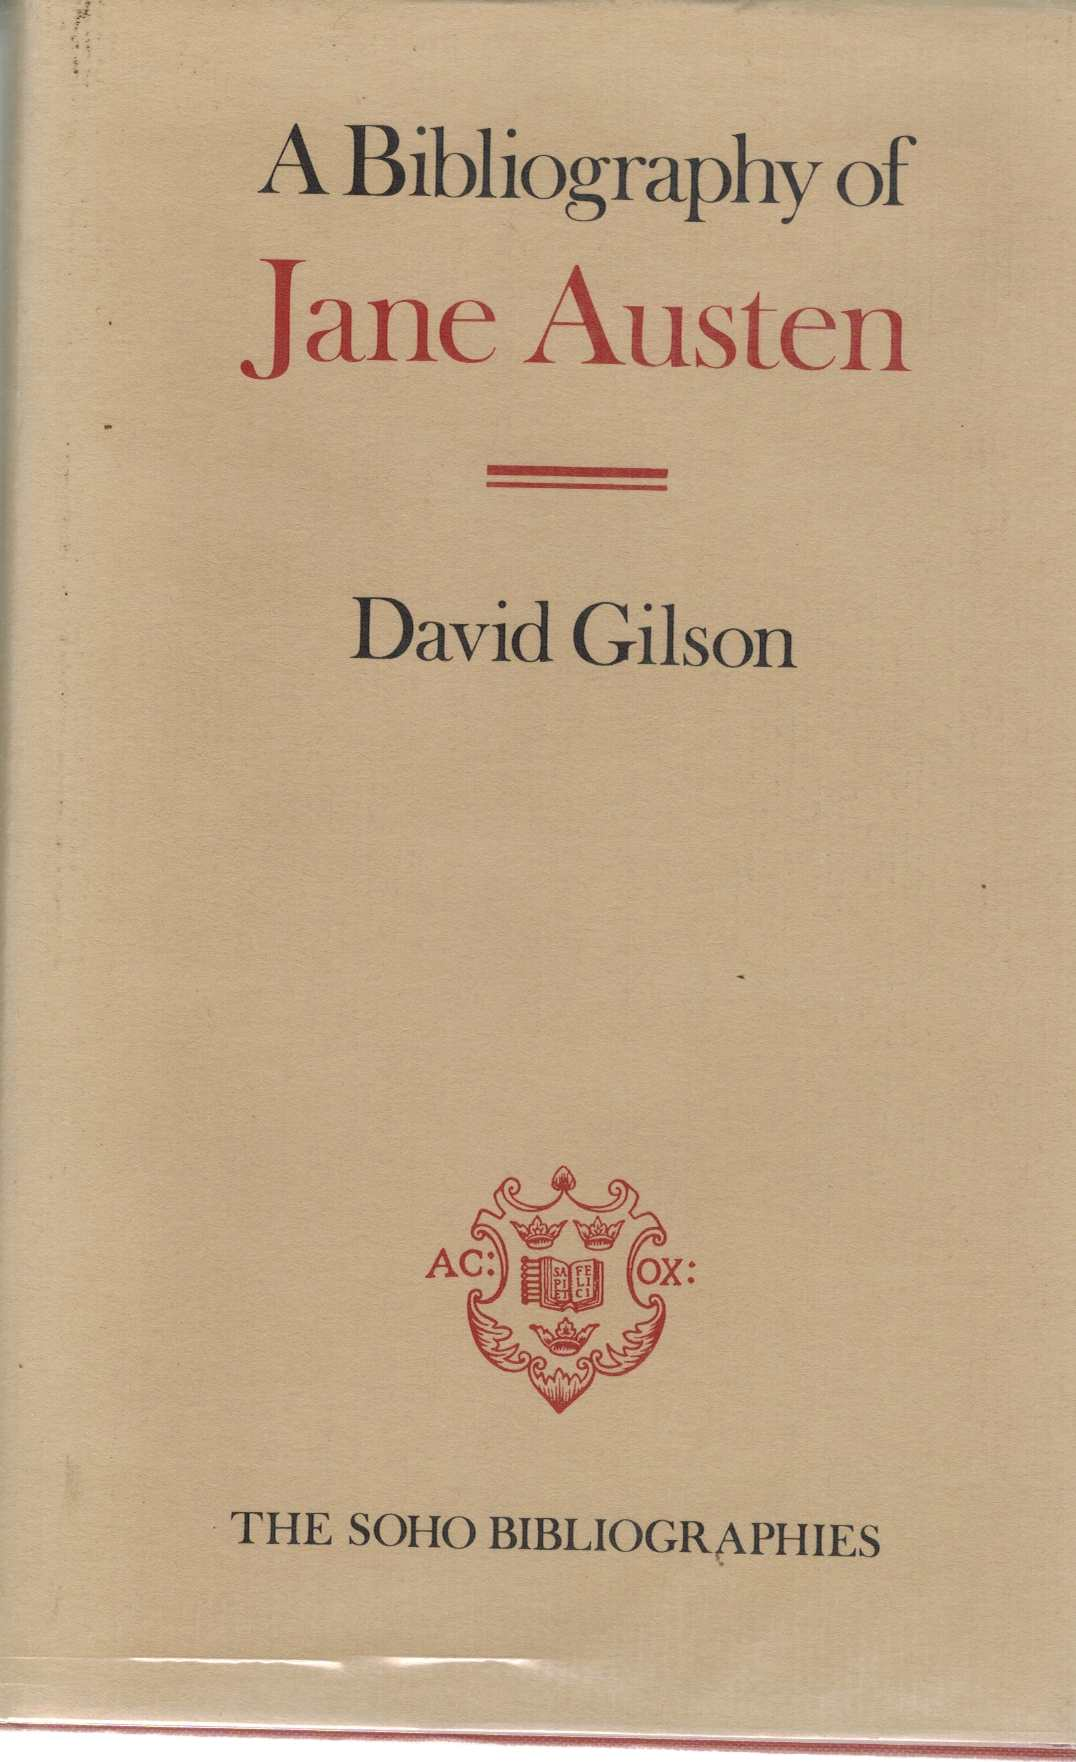 Bibliography of Jane Austen - Gilson, David